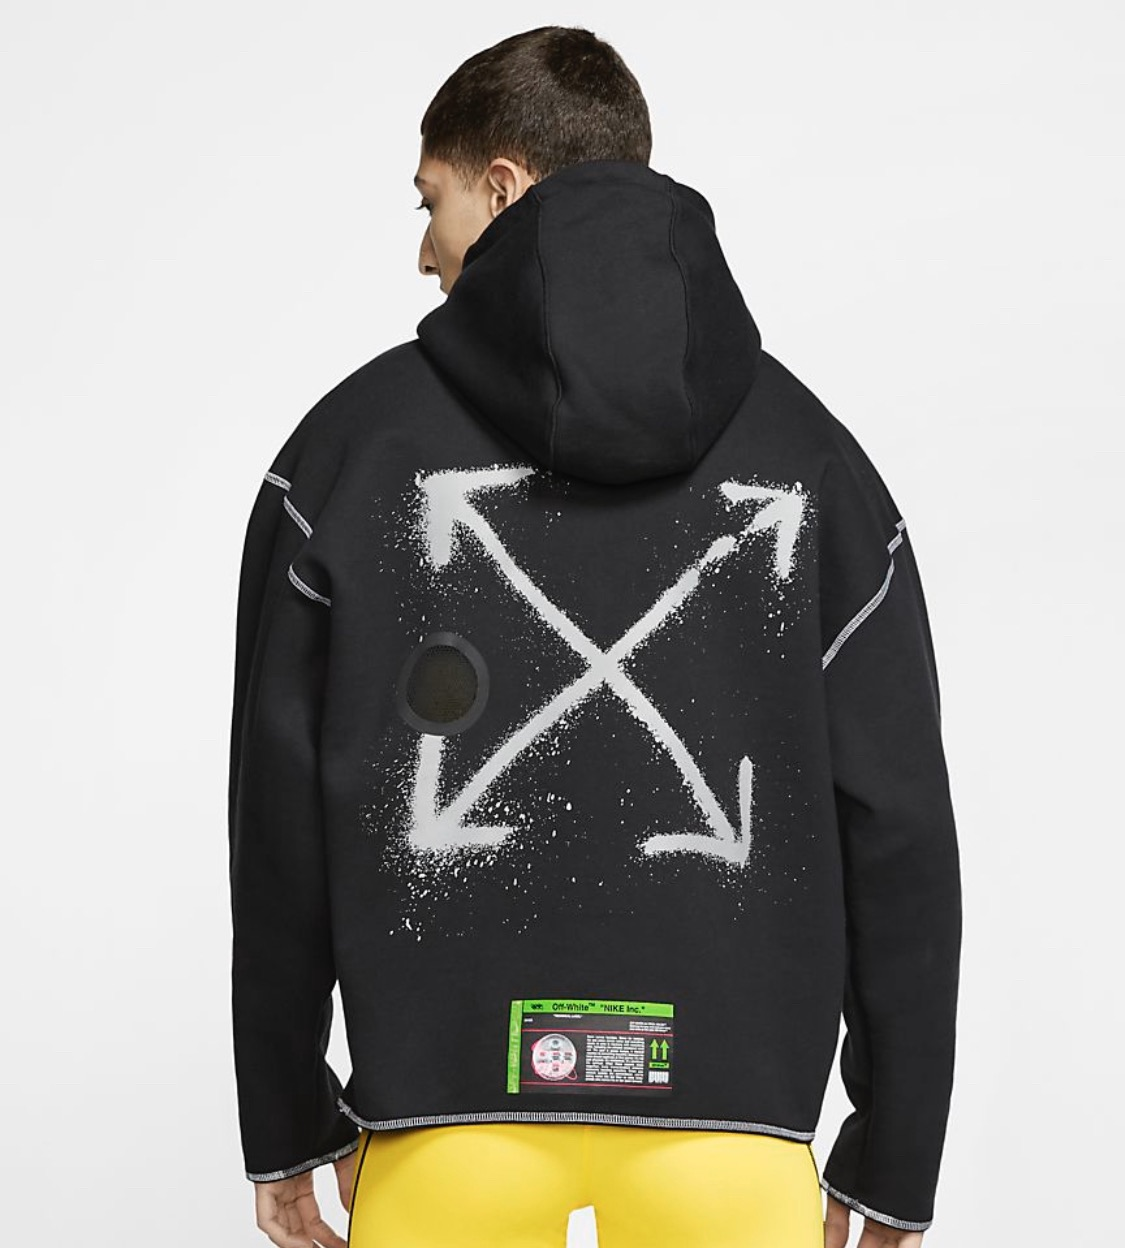 recursos humanos Puntualidad contraste  Nike Off White X Nike Hoodie Black ‼️final Drop‼️   Grailed